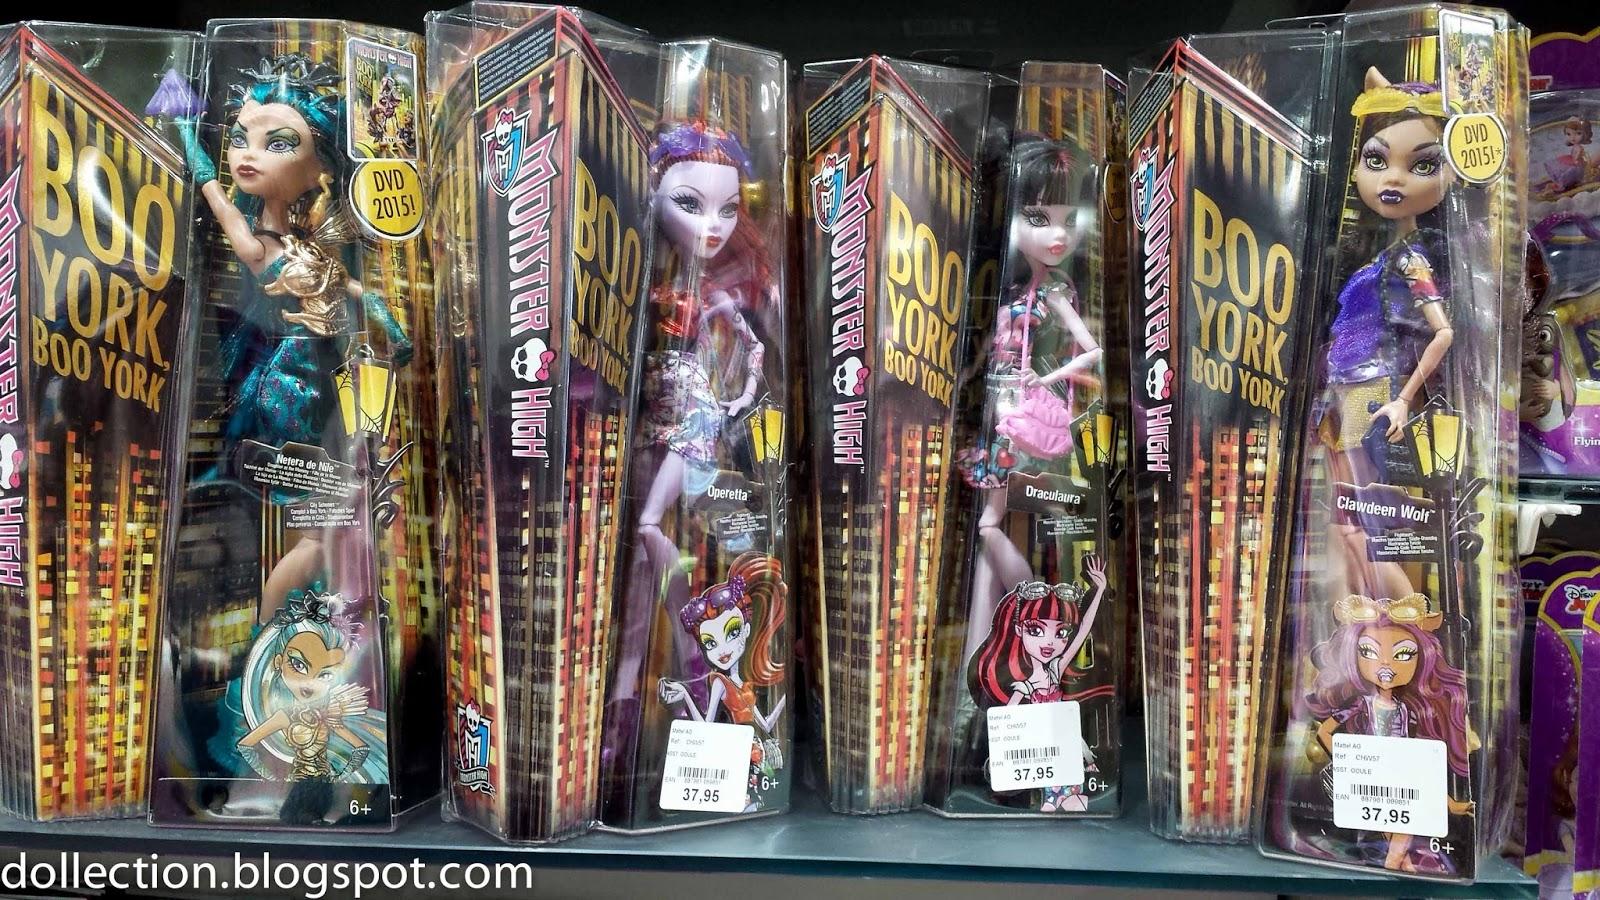 Doll hunting in geneva switzerland manor king jouet globus migros and franz carl weber - Monster high king jouet ...